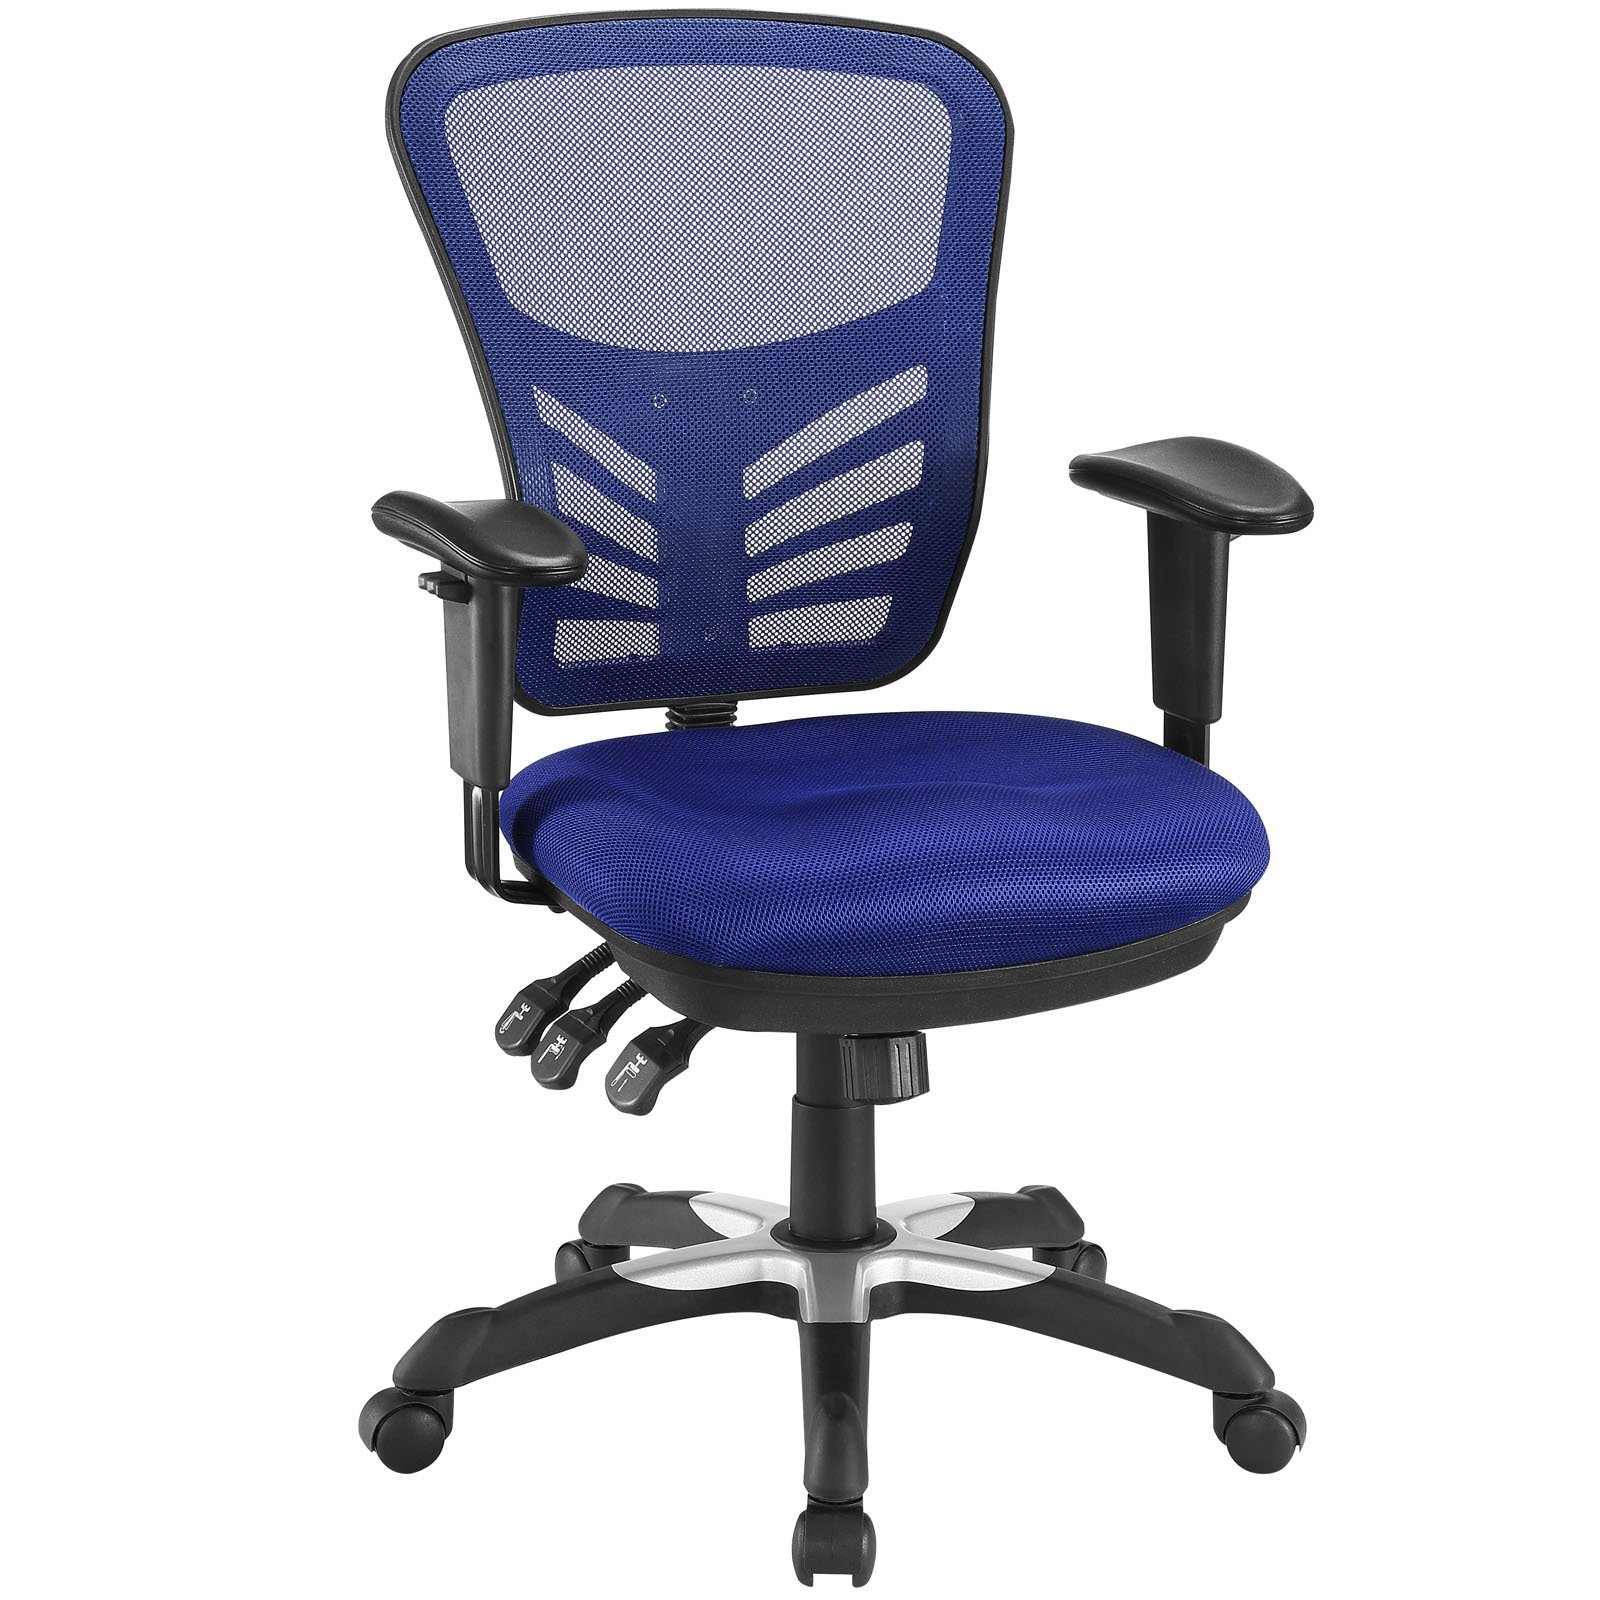 Modway Articulate Office Chair, Blue